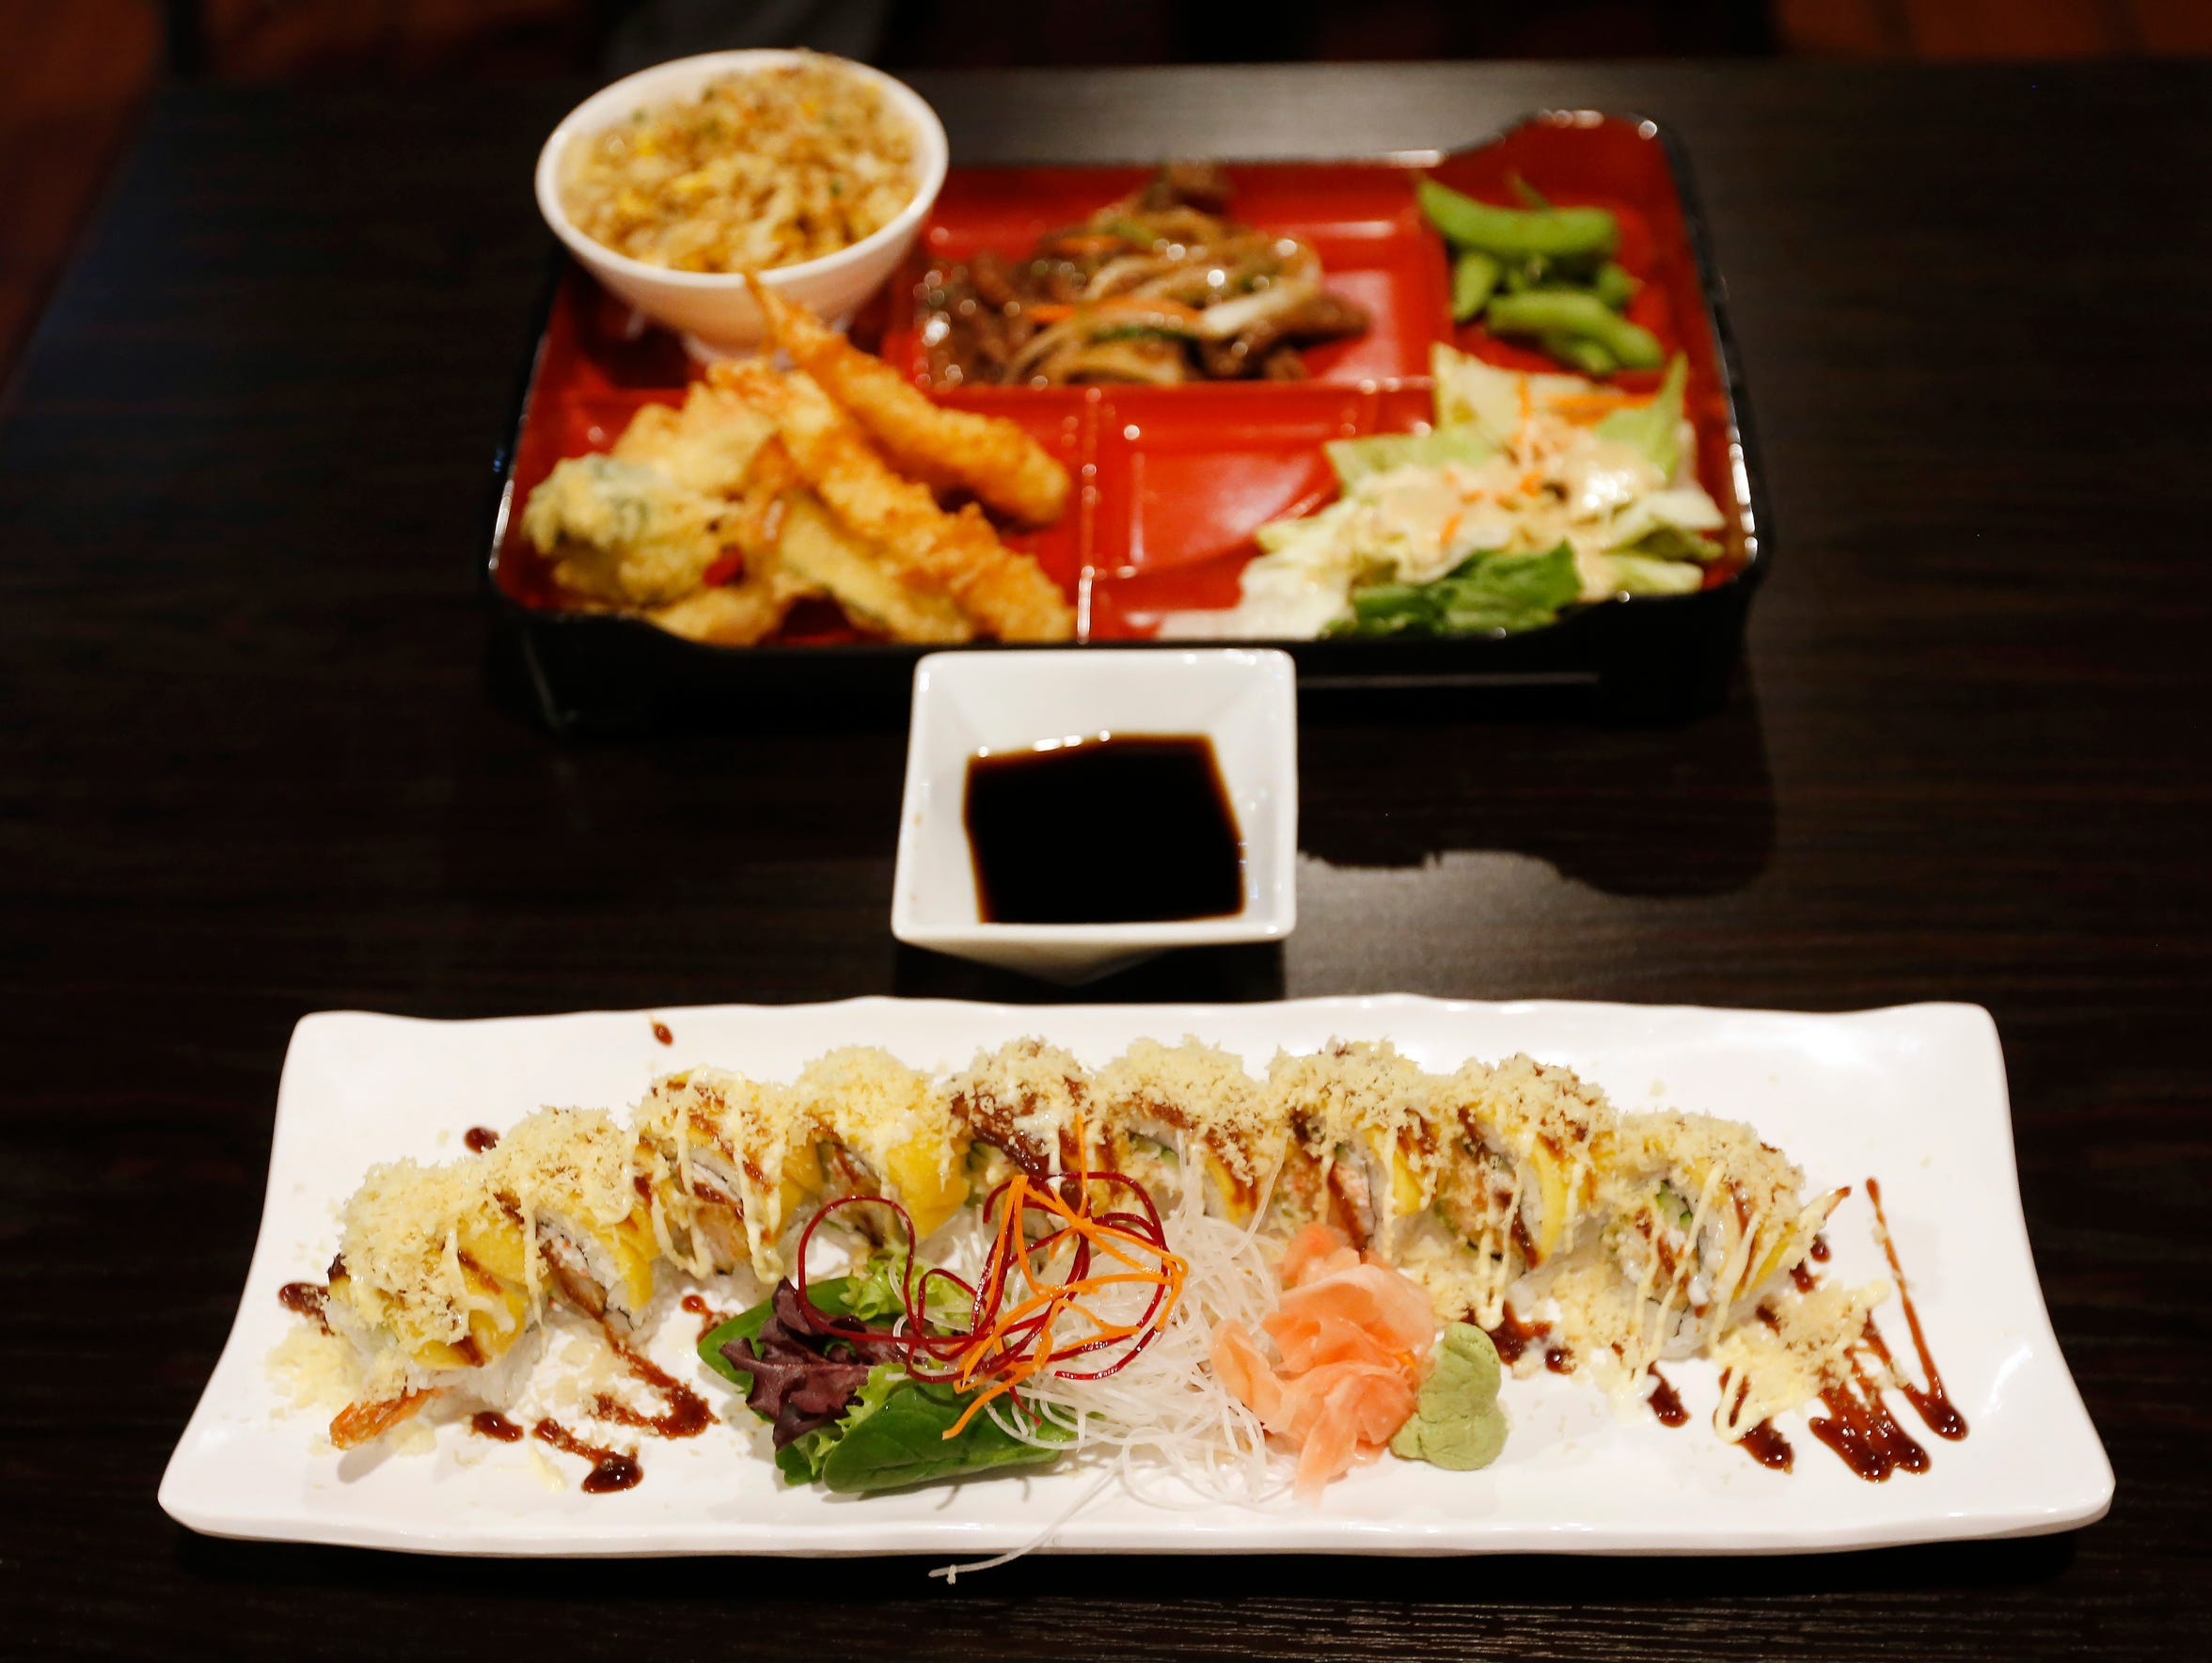 The Mango Crunch Roll at Momo Sushi & Grill at 120